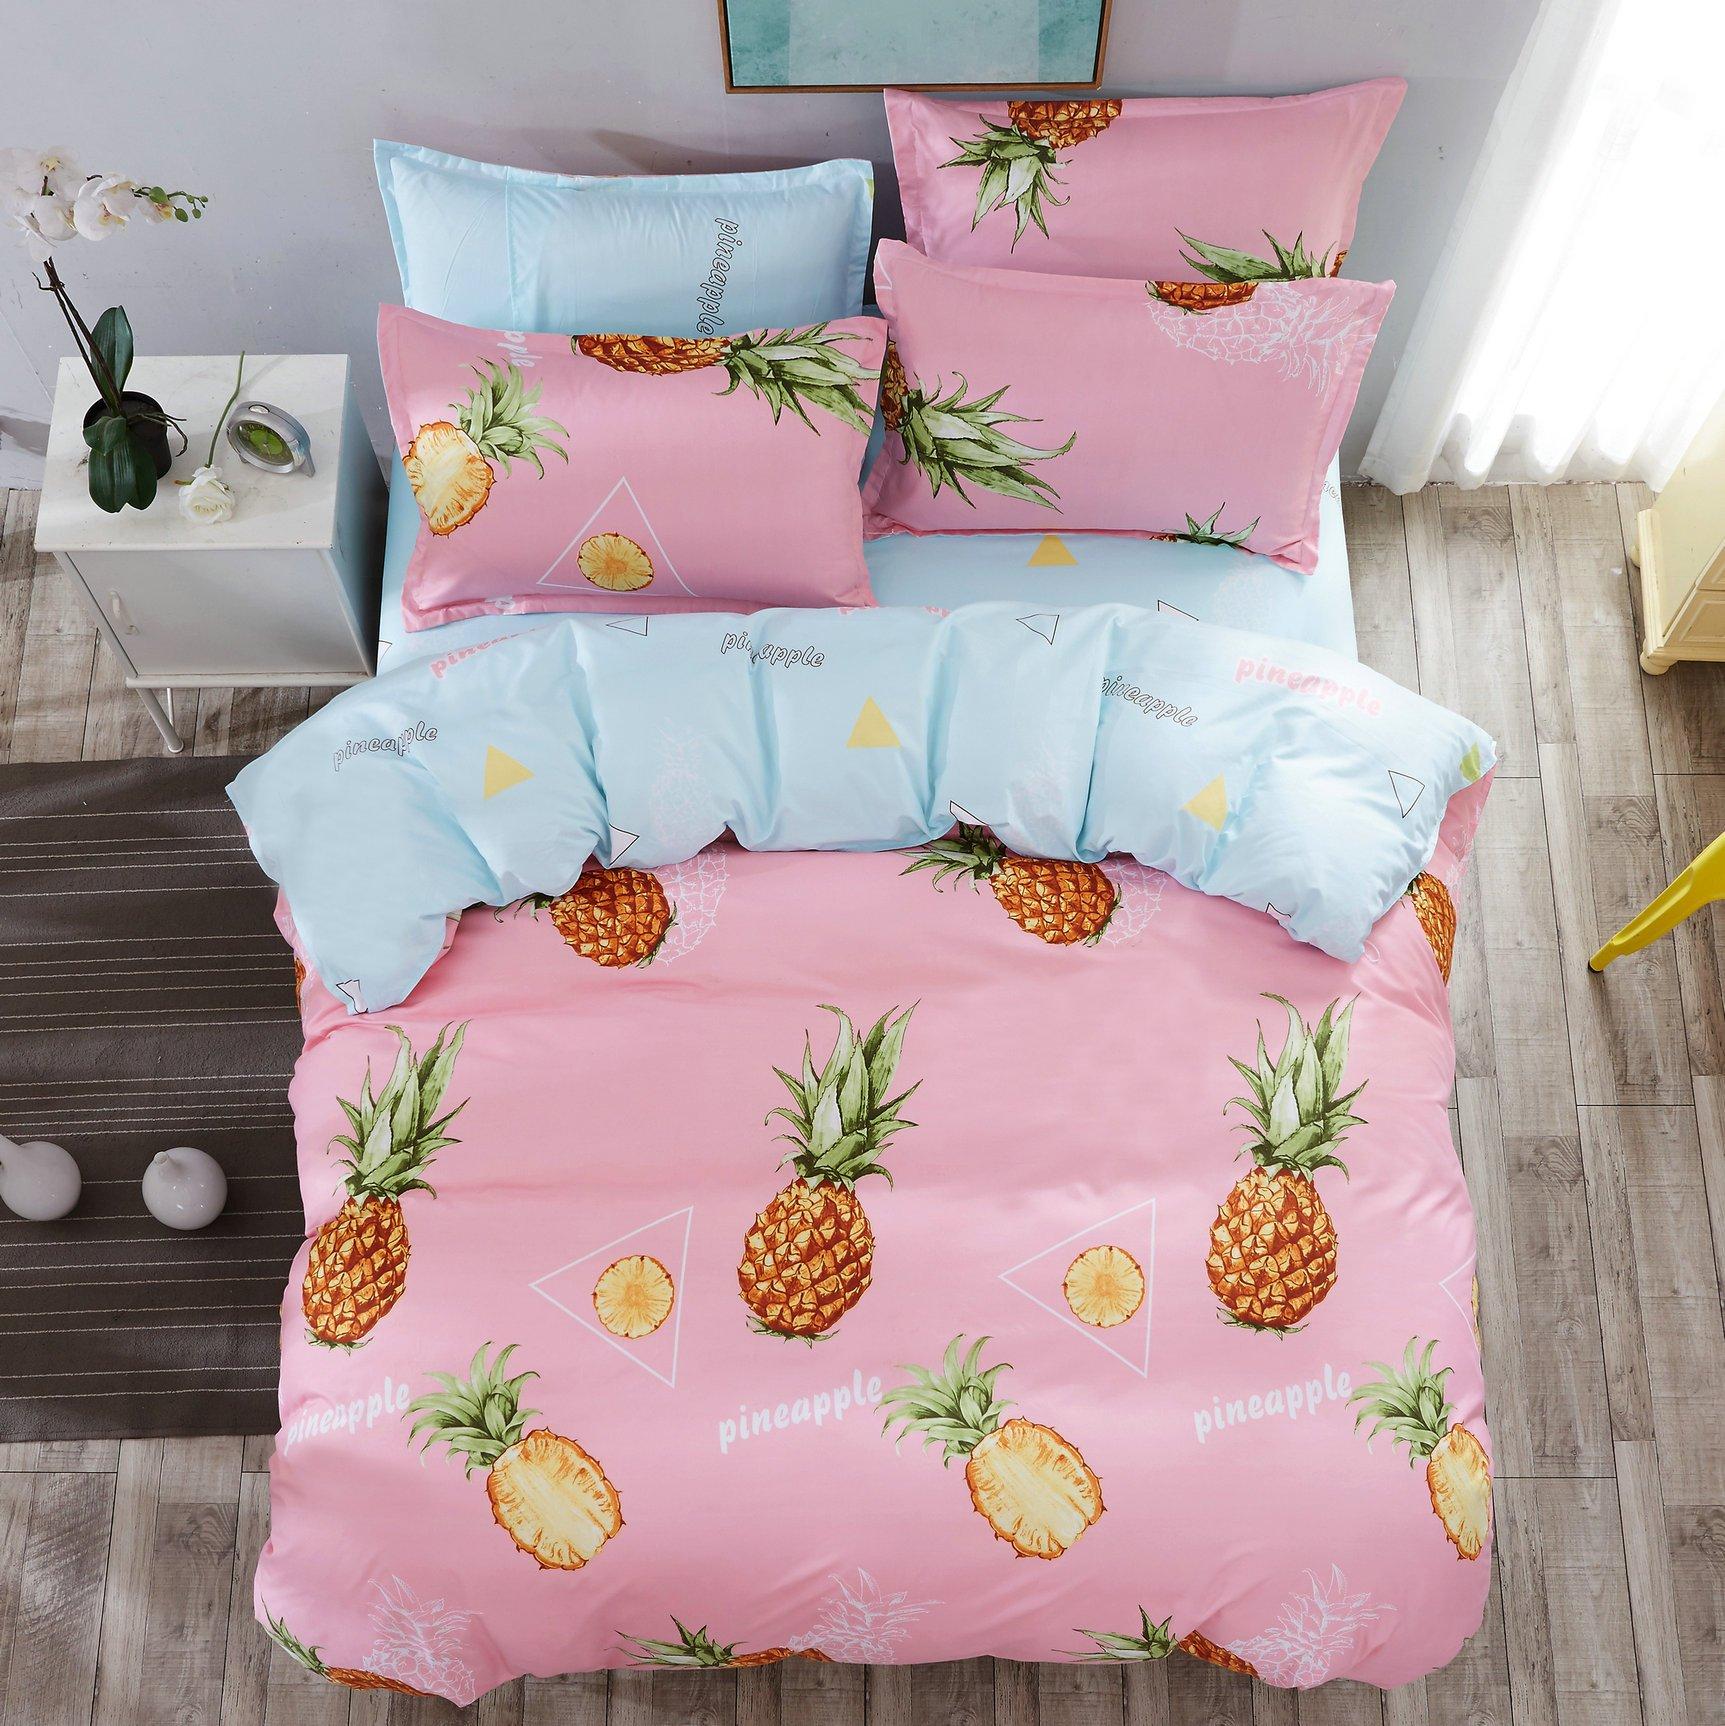 4pcs Children Beddingset Duvet Cover Set One Duvet Cover No Comforter One Flatsheet Two Pillowcase For Bedroom Twin Full Queen Crazy Pineapple Design (Queen, 78''x90'', Pineapple, Pink)